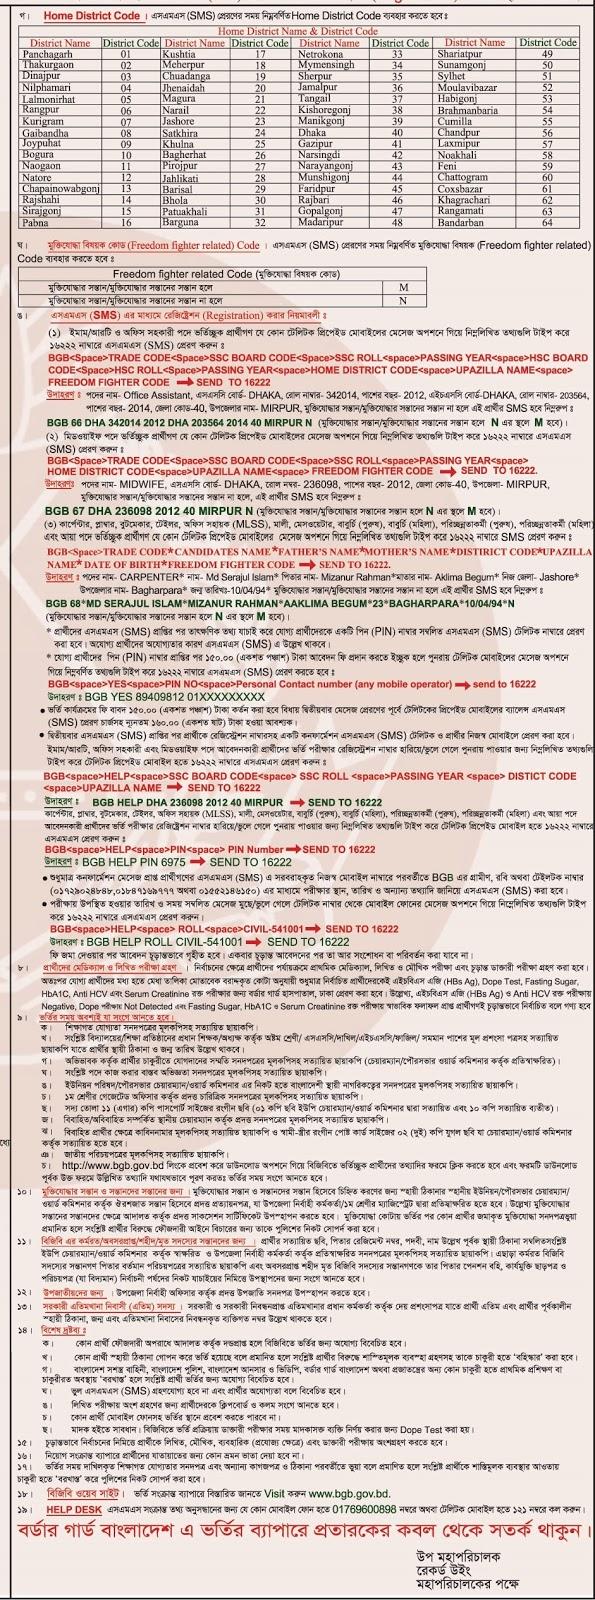 www.bgb.gov.bd, বিজিবি জব বিজ্ঞপ্তি ২০২০ ৯৯ ব্যাচ, www.bgb.gov.bd চাকরির বিজ্ঞপ্তি, বিজিবি সিপাহী চাকরীর বিজ্ঞপ্তি ২০২০, সর্বশেষ বাংলাদেশ বর্ডার গার্ড বিজিবি চাকরির বিজ্ঞপ্তি ২০২০ ব্যাচের জন্য বিবিসি, ৯৫ ব্যাচের বিজ্ঞপ্তি মোট পুরুষ ও মহিলা পদ, বর্ডার গার্ড বাংলাদেশ বিজিবি জব সার্কুলার (৯৯ ব্যাচ), বিজিবি সোলার জব সার্কুলার ২০২০, বিজিবি চাকরীর আবেদনের প্রয়োজনীয়তা, বিজিবি ভর্তির প্রয়োজনীয়তা, বিজিবি চাকরি নিবন্ধকরণ পদ্ধতি, বিজিবি জব ইনফো, বিজিবি বিজ্ঞপ্তি, বিজিবিতে যোগ দিন, ডাউনলোড বর্ডার গার্ড বাংলাদেশ (বিজিবি) জব আবেদন প্রক্রিয়া ২০২০, বিজিবি জব সার্কুলার নতুন, www বিজিবি গভ কম, www বিজিবি গভ বিডি সার্কুলার ২০২০, www বিজিবি জিওভ বিডি, বিজিবি গভ বিডি সার্কুলার, বিজিবি সোড্ডার চাকরী মার্চ ২০২০, www বিজিবি গভ বিডি কম, www ১ অক্টোবর 2020 বিজিবি জব সার্কুলার কম, বিজিবি জব সার্কুলার 2020 বিডি, www.bgb.gov.bd বিজ্ঞপ্তি, বর্ডার গার্ডের সর্বশেষ সংবাদ, বিজিবি সিভিল জব সার্কুলার 2020, বিজিবি ভর্তি সার্কুলার 2020 95 ব্যাচ